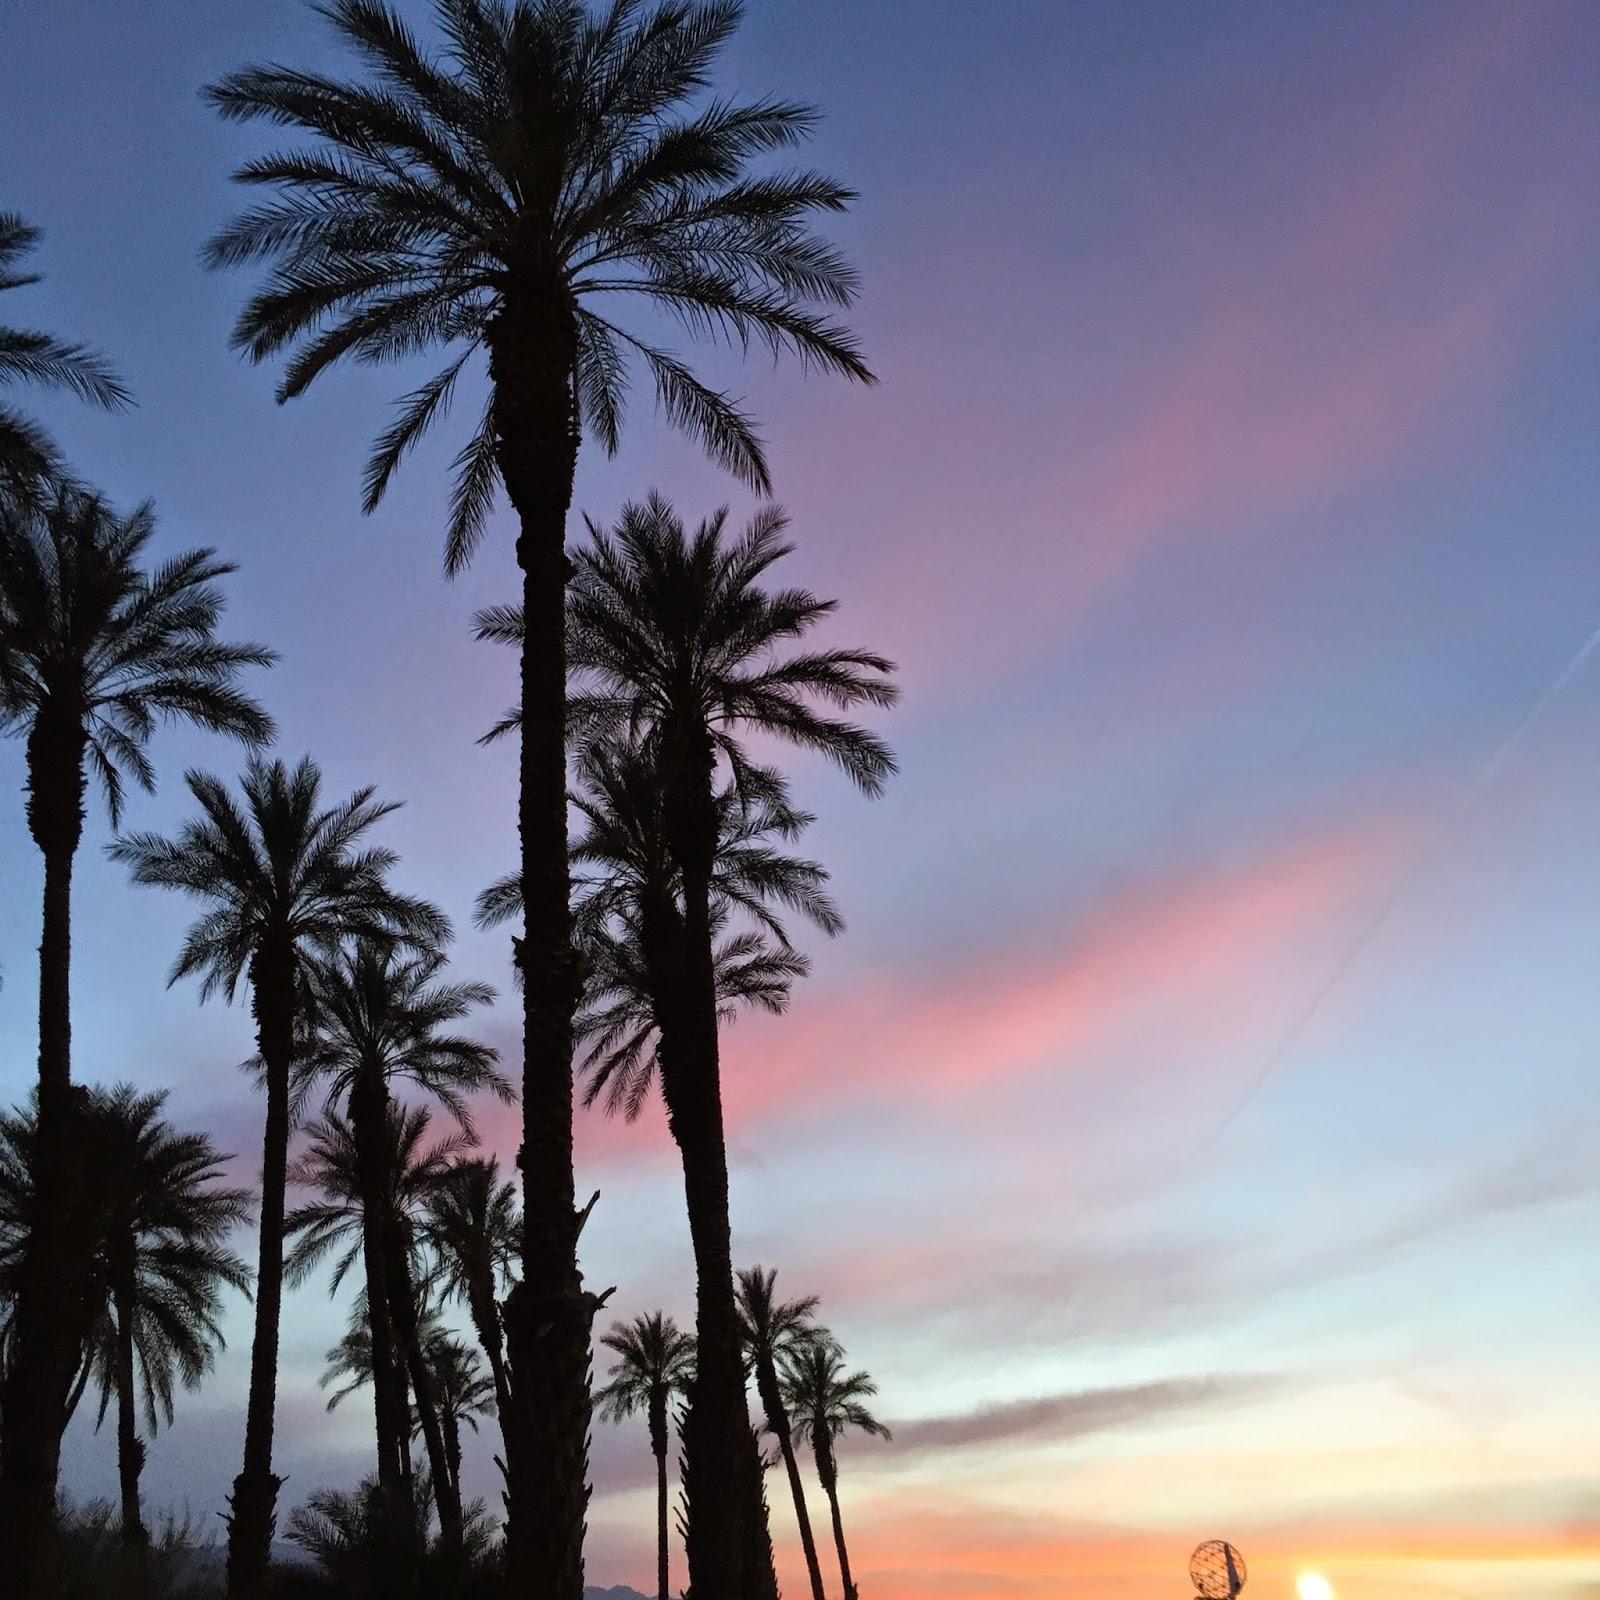 Coachella Sunset, Coachella Butterfly, Festival Fashion, What to wear to Coachella